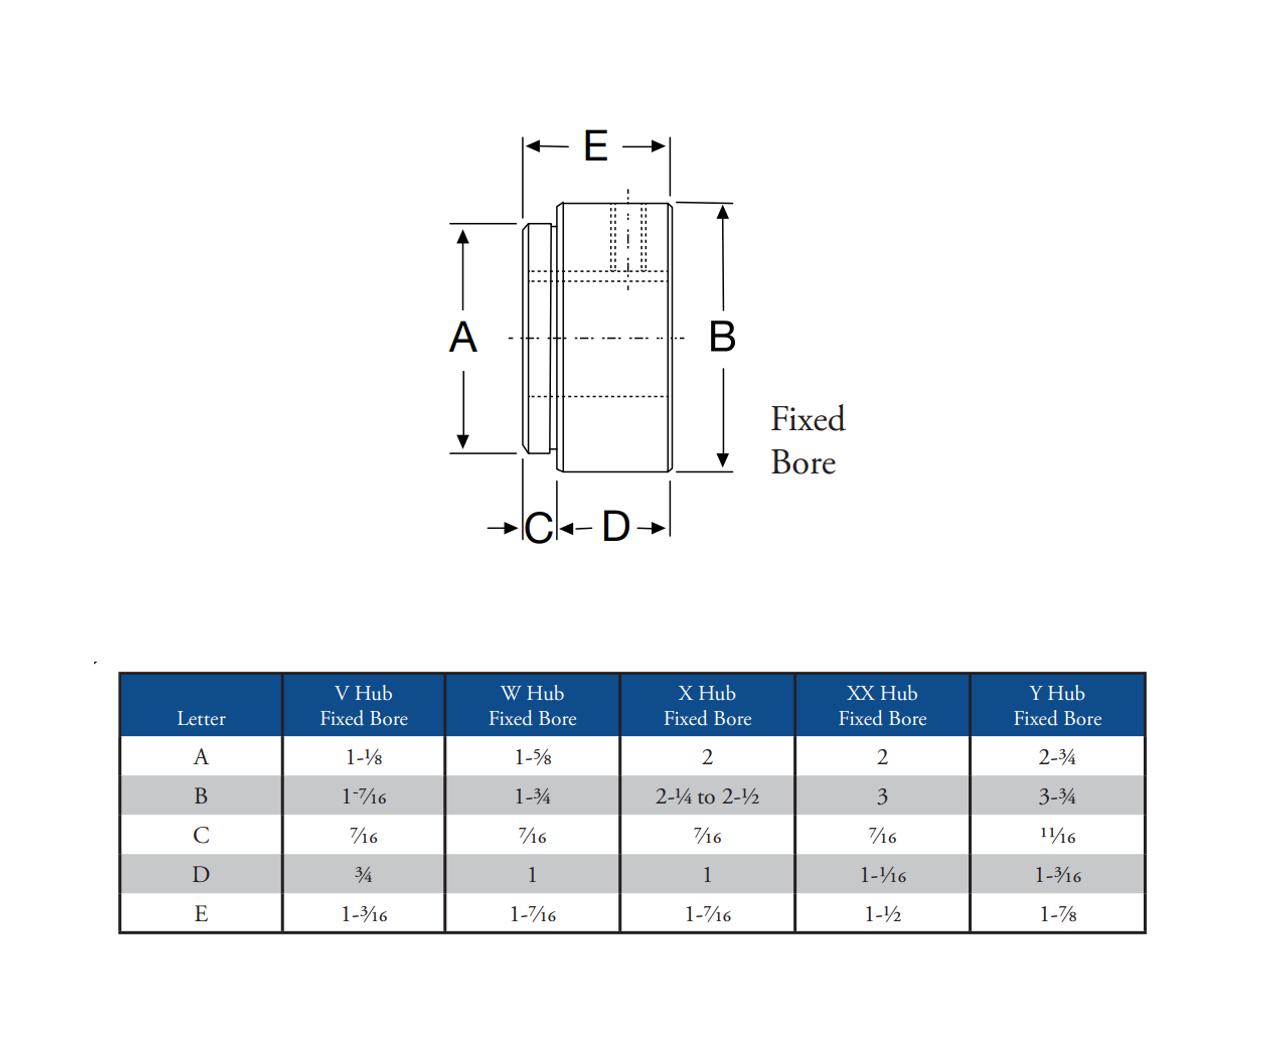 2 Diameter w// 5//16 Keyway 1-3//8 Bore Weld on Hub For X Series Farmer Bobs Parts WSH30022